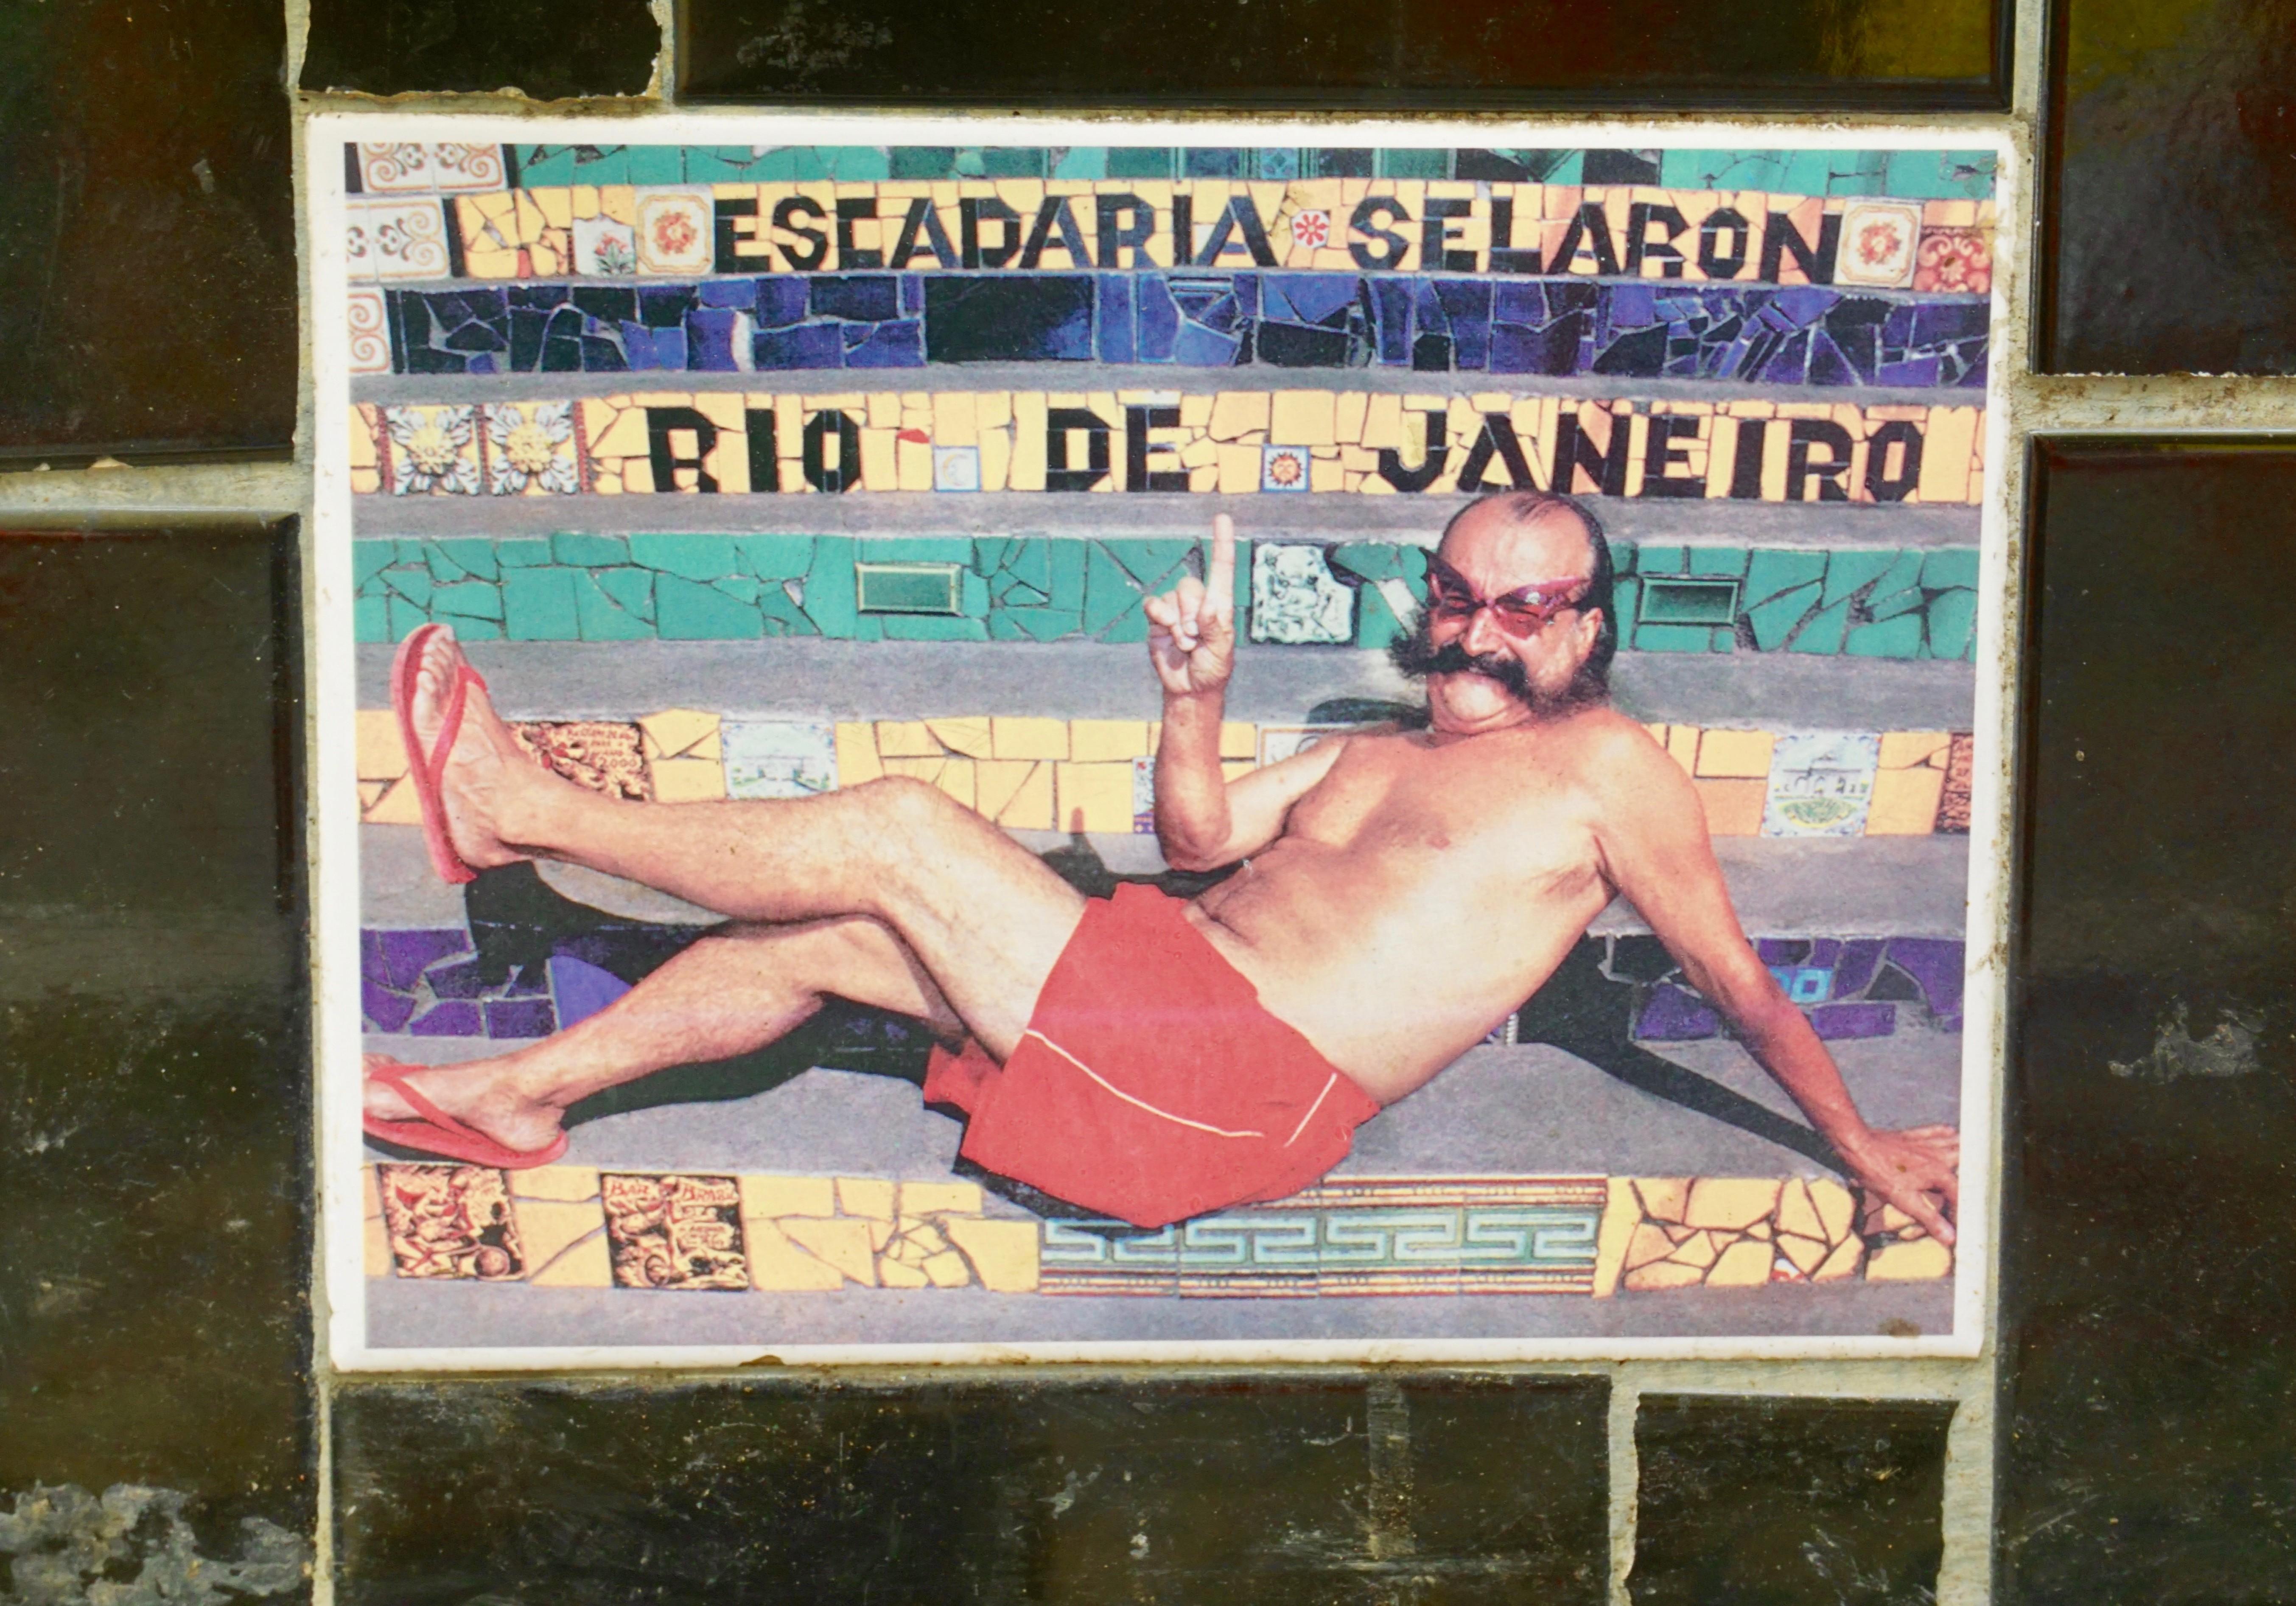 Chilean-born artist Jorge Selarón created the Escadaria Selarón ( 'Selaron Steps')